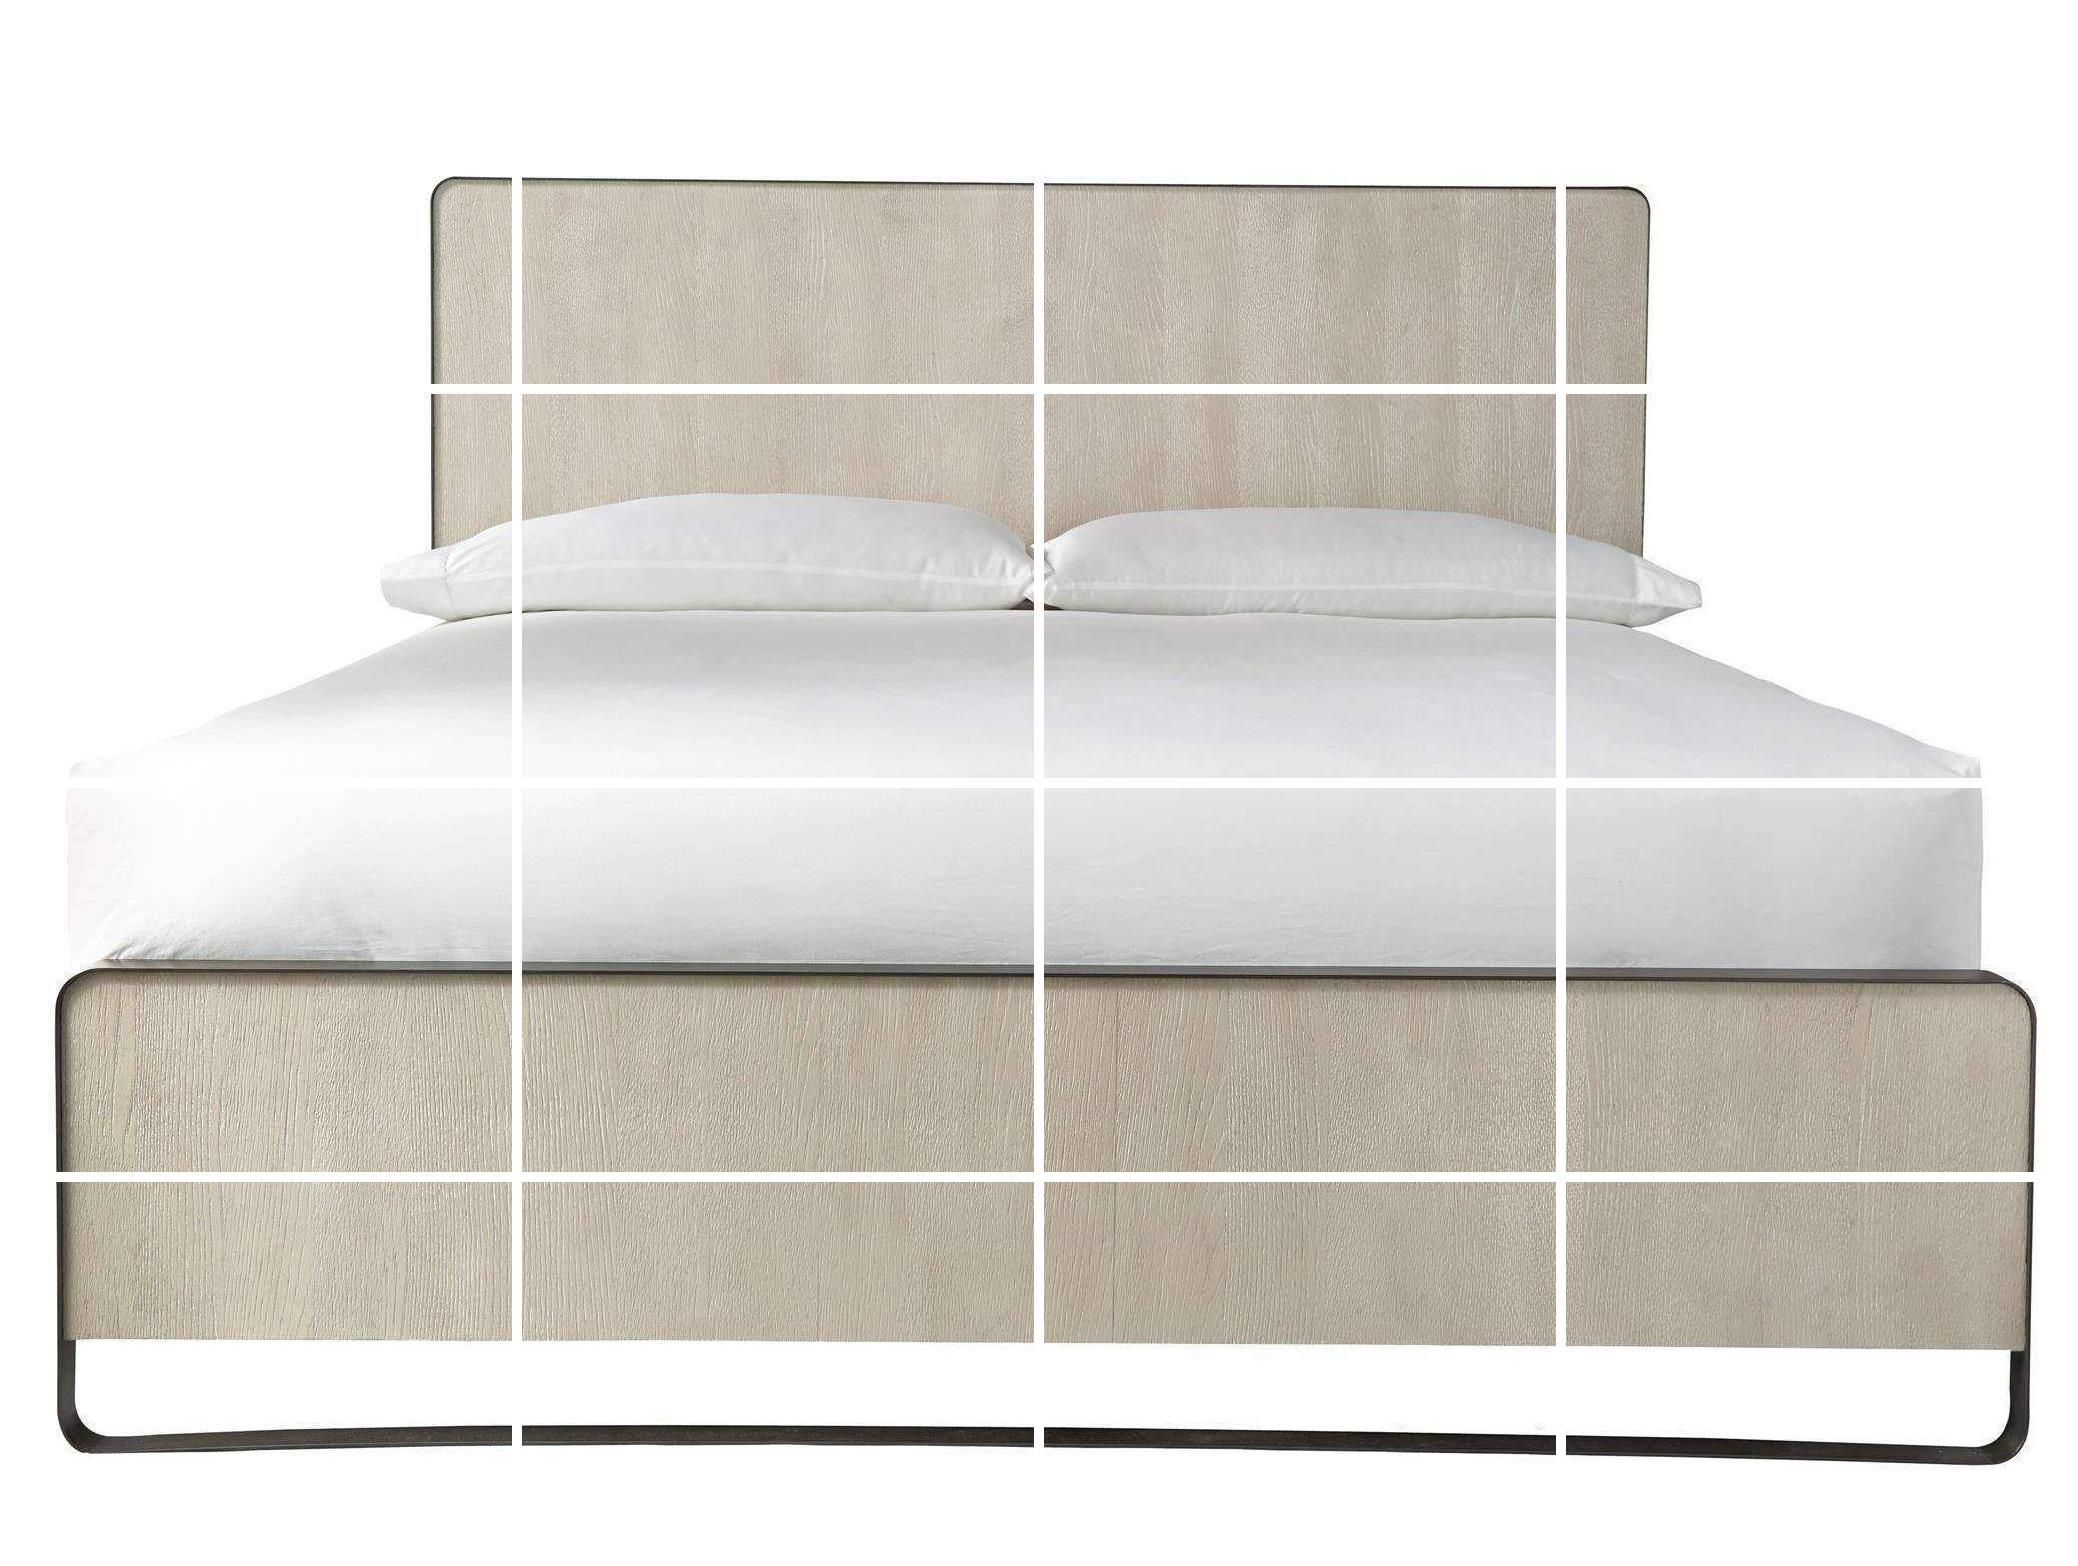 Bedroom Furniture Packages  Bedroom Furniture Sets With Bed